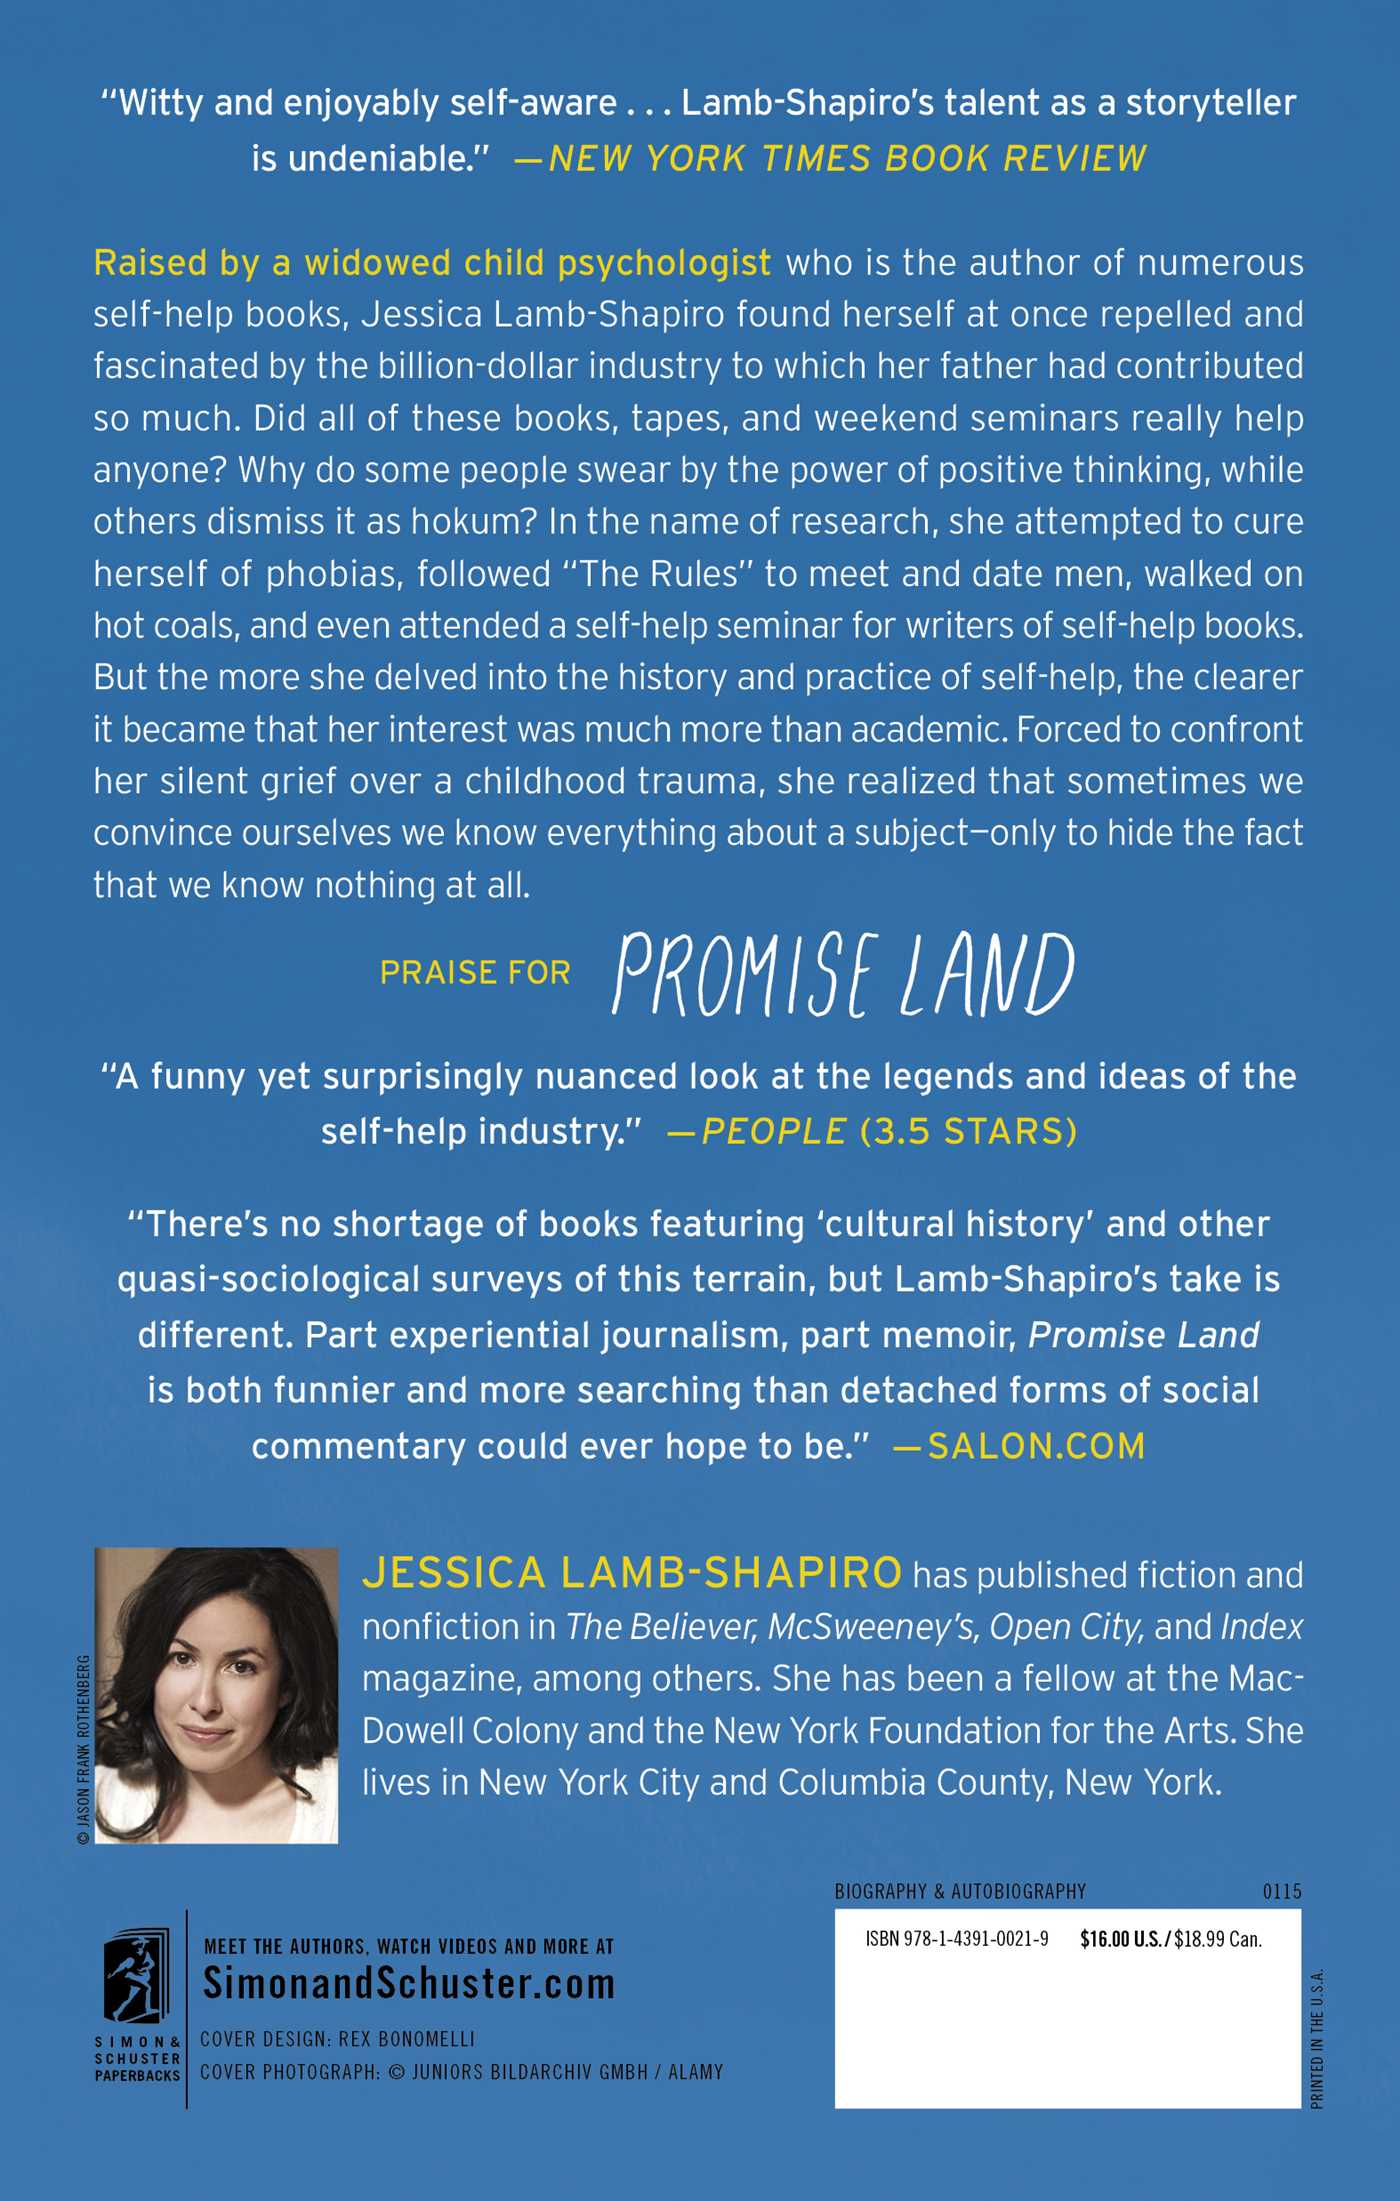 Promise land 9781439100219 hr back